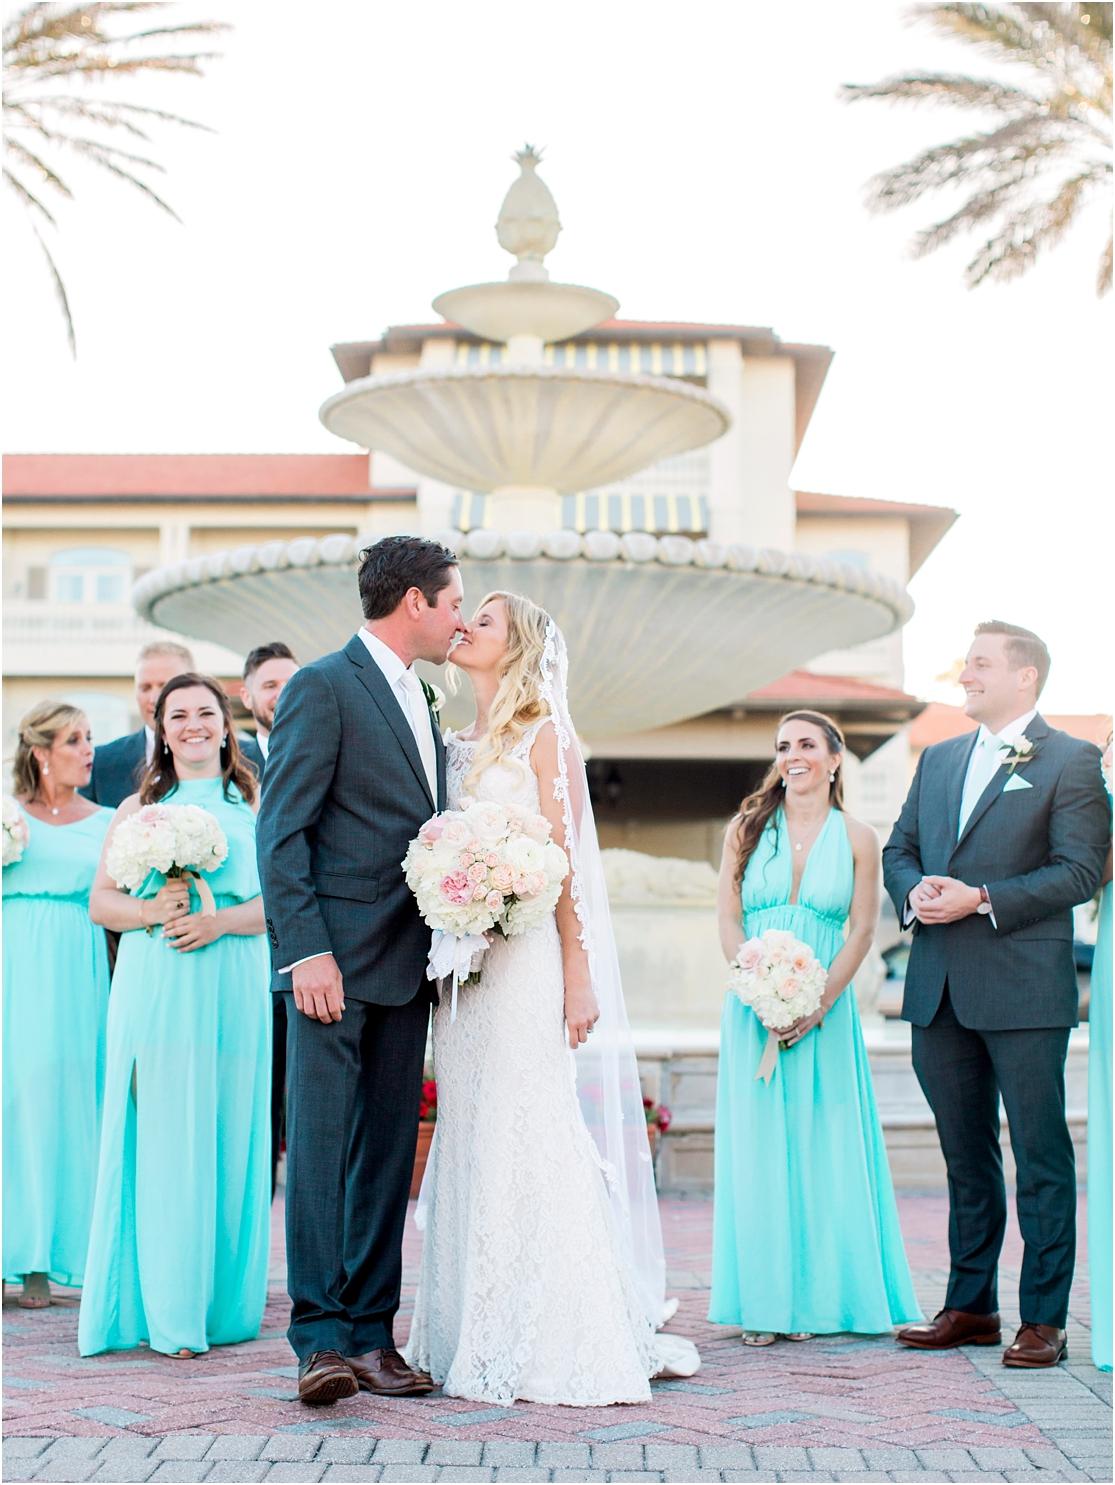 Lisa Silva Photography- Ponte Vedra Beach and Jacksonville, Florida Fine Art Film Wedding Photography- Wedding at the Ponte Vedra Inn and Club_0061.jpg